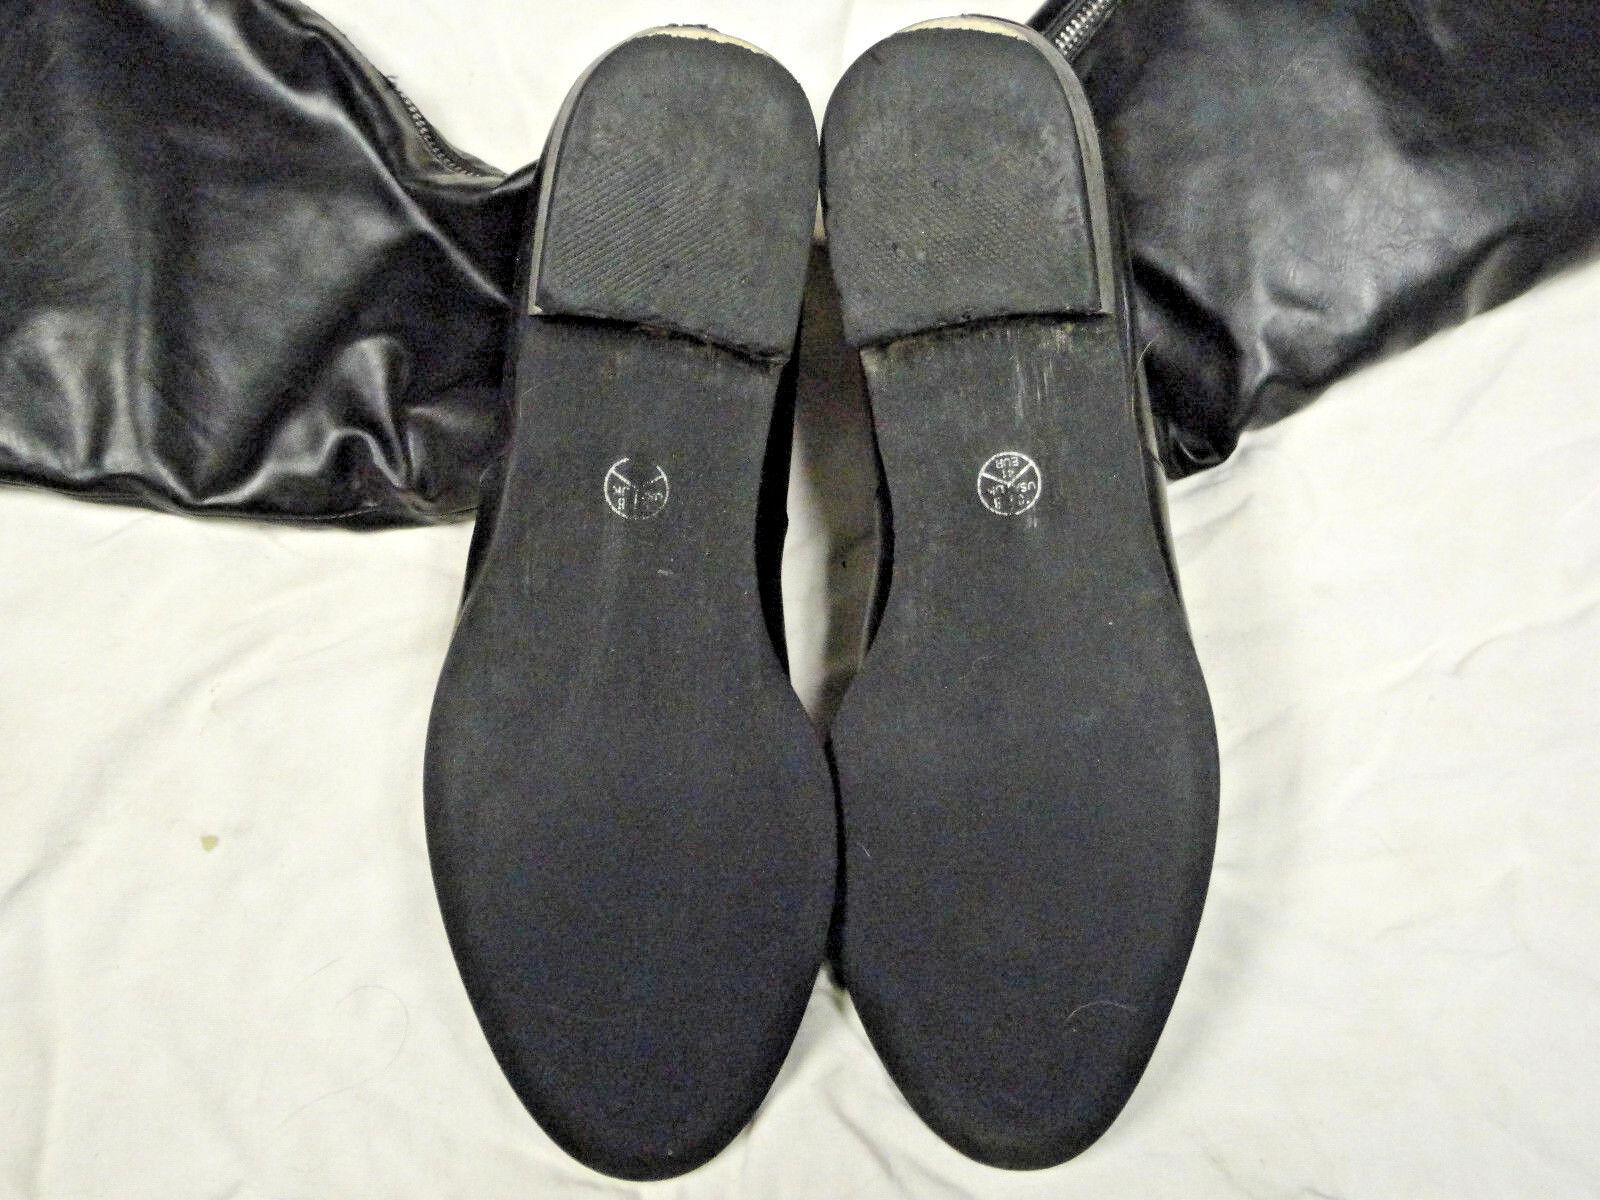 UNZE London leather black leather London knee high boot   Size 10   Eur 41 00461e